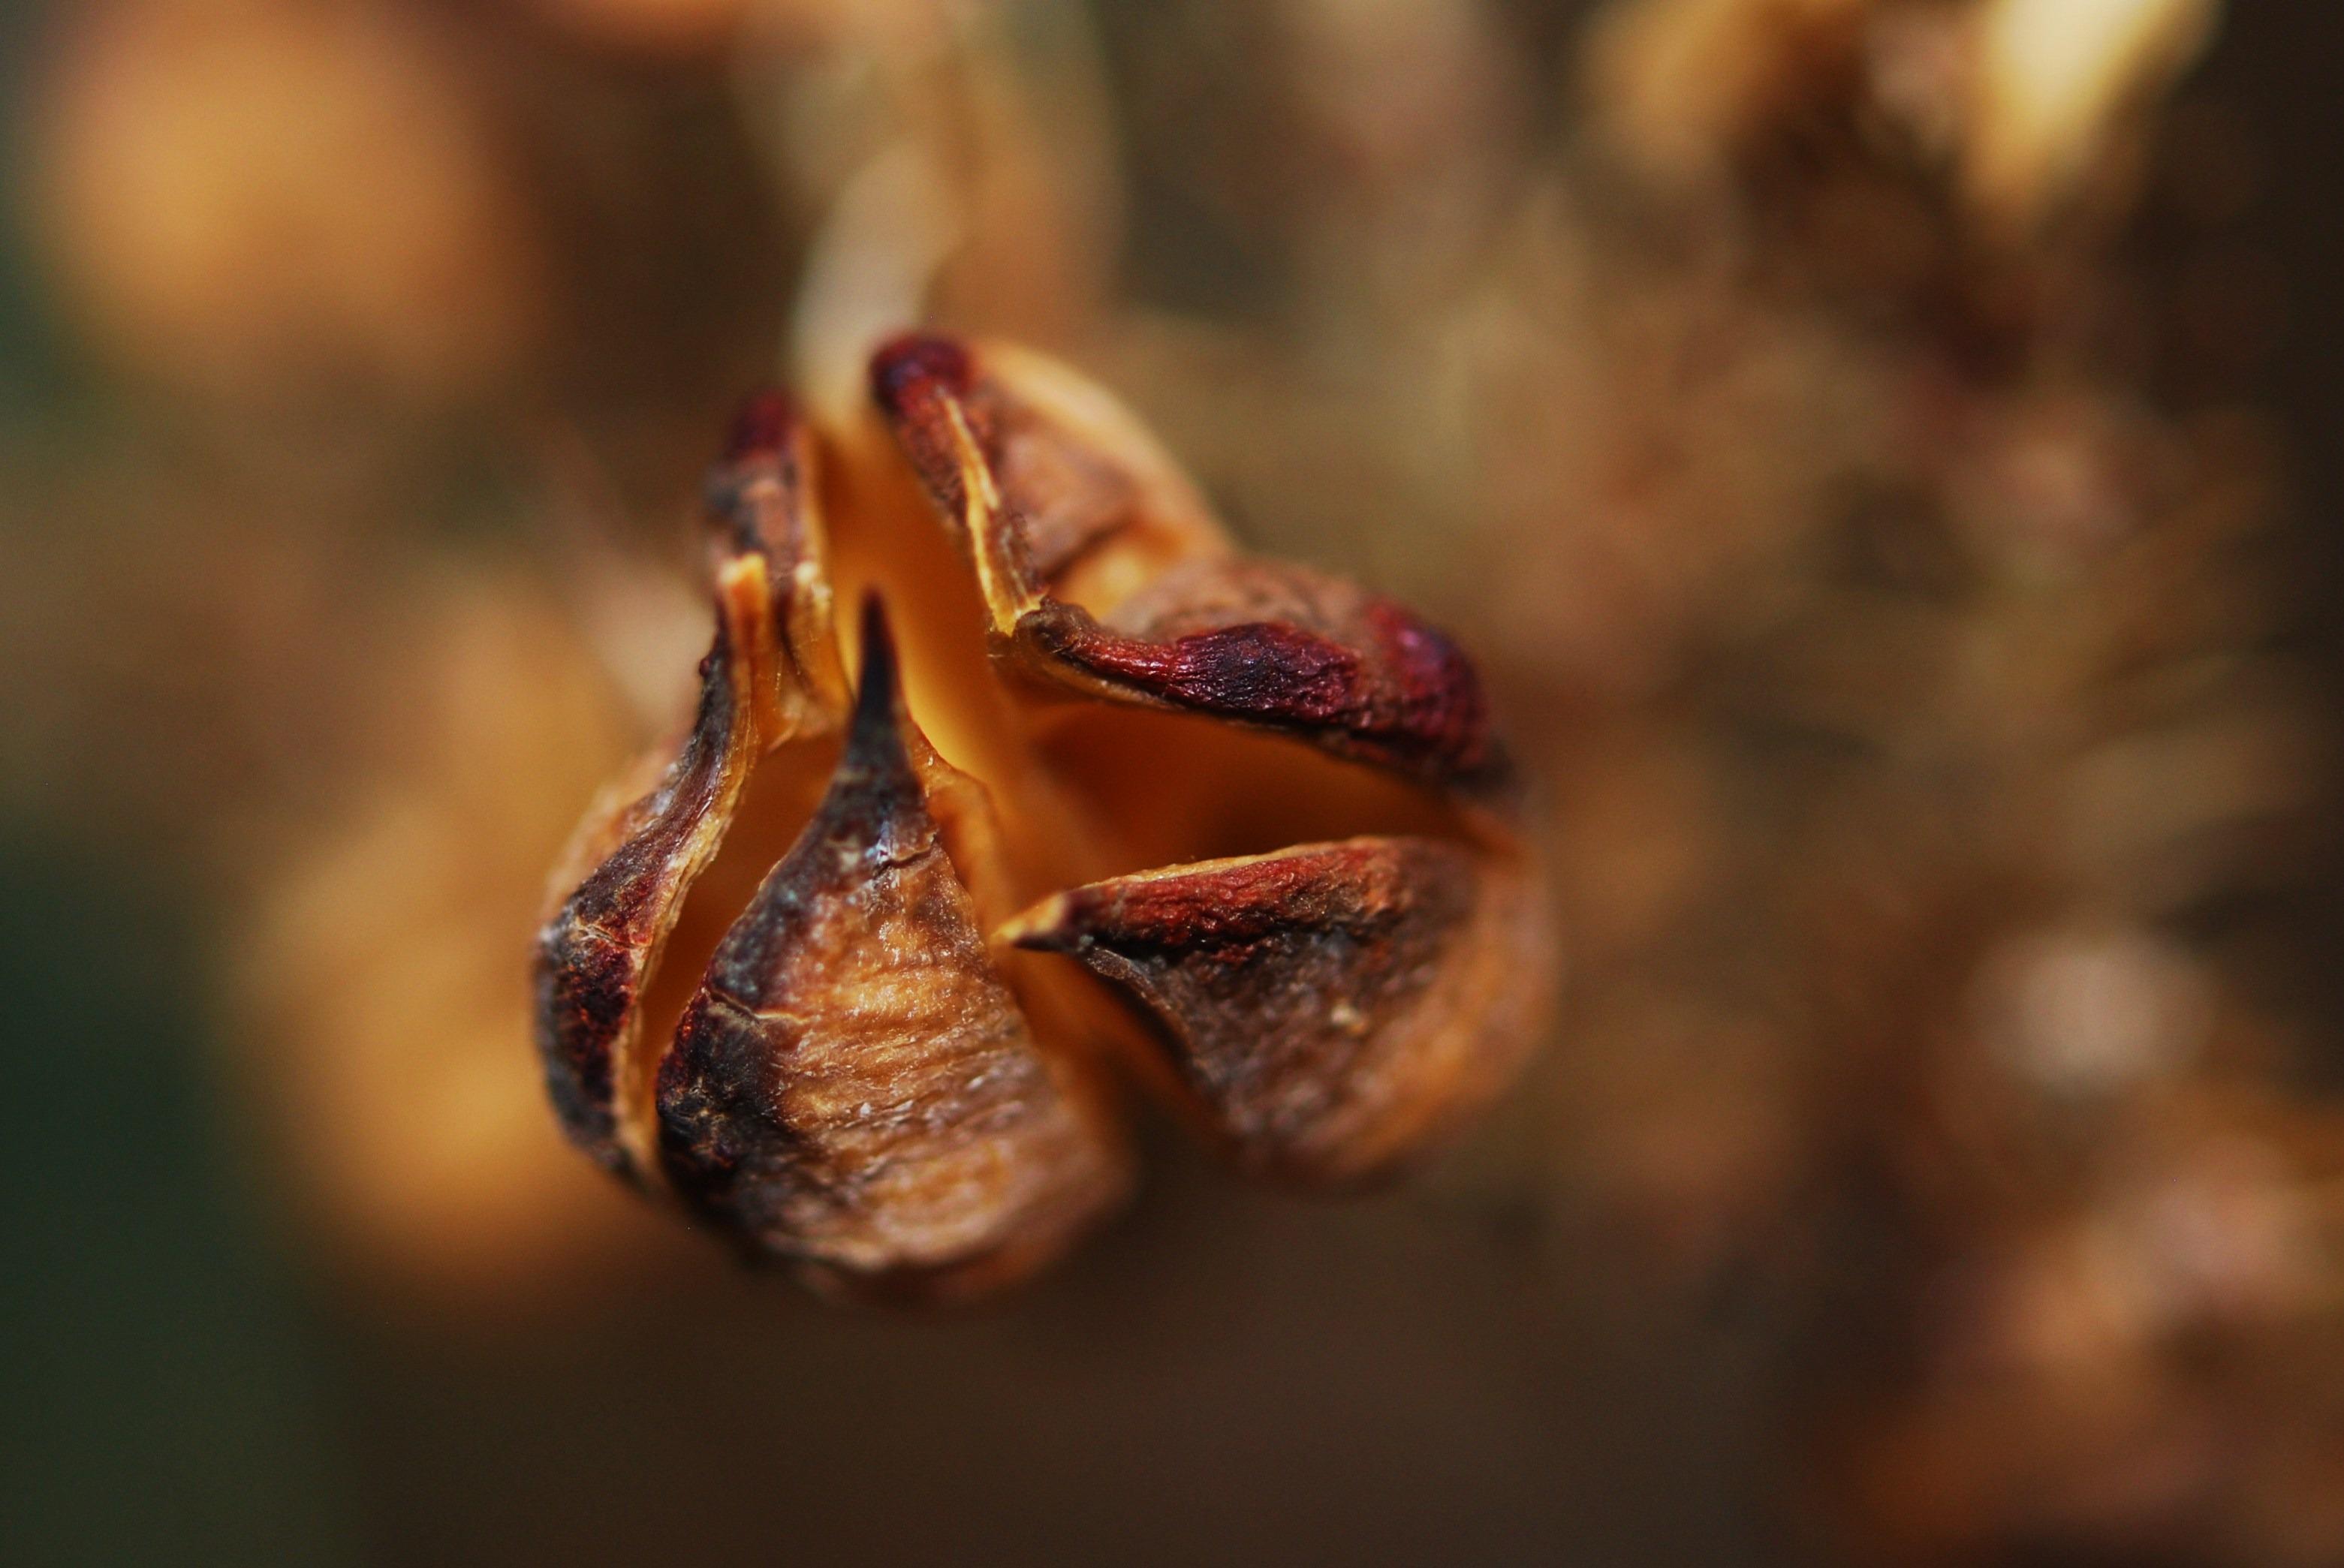 Free Images : tree, nature, branch, open, leaf, flower, petal ...